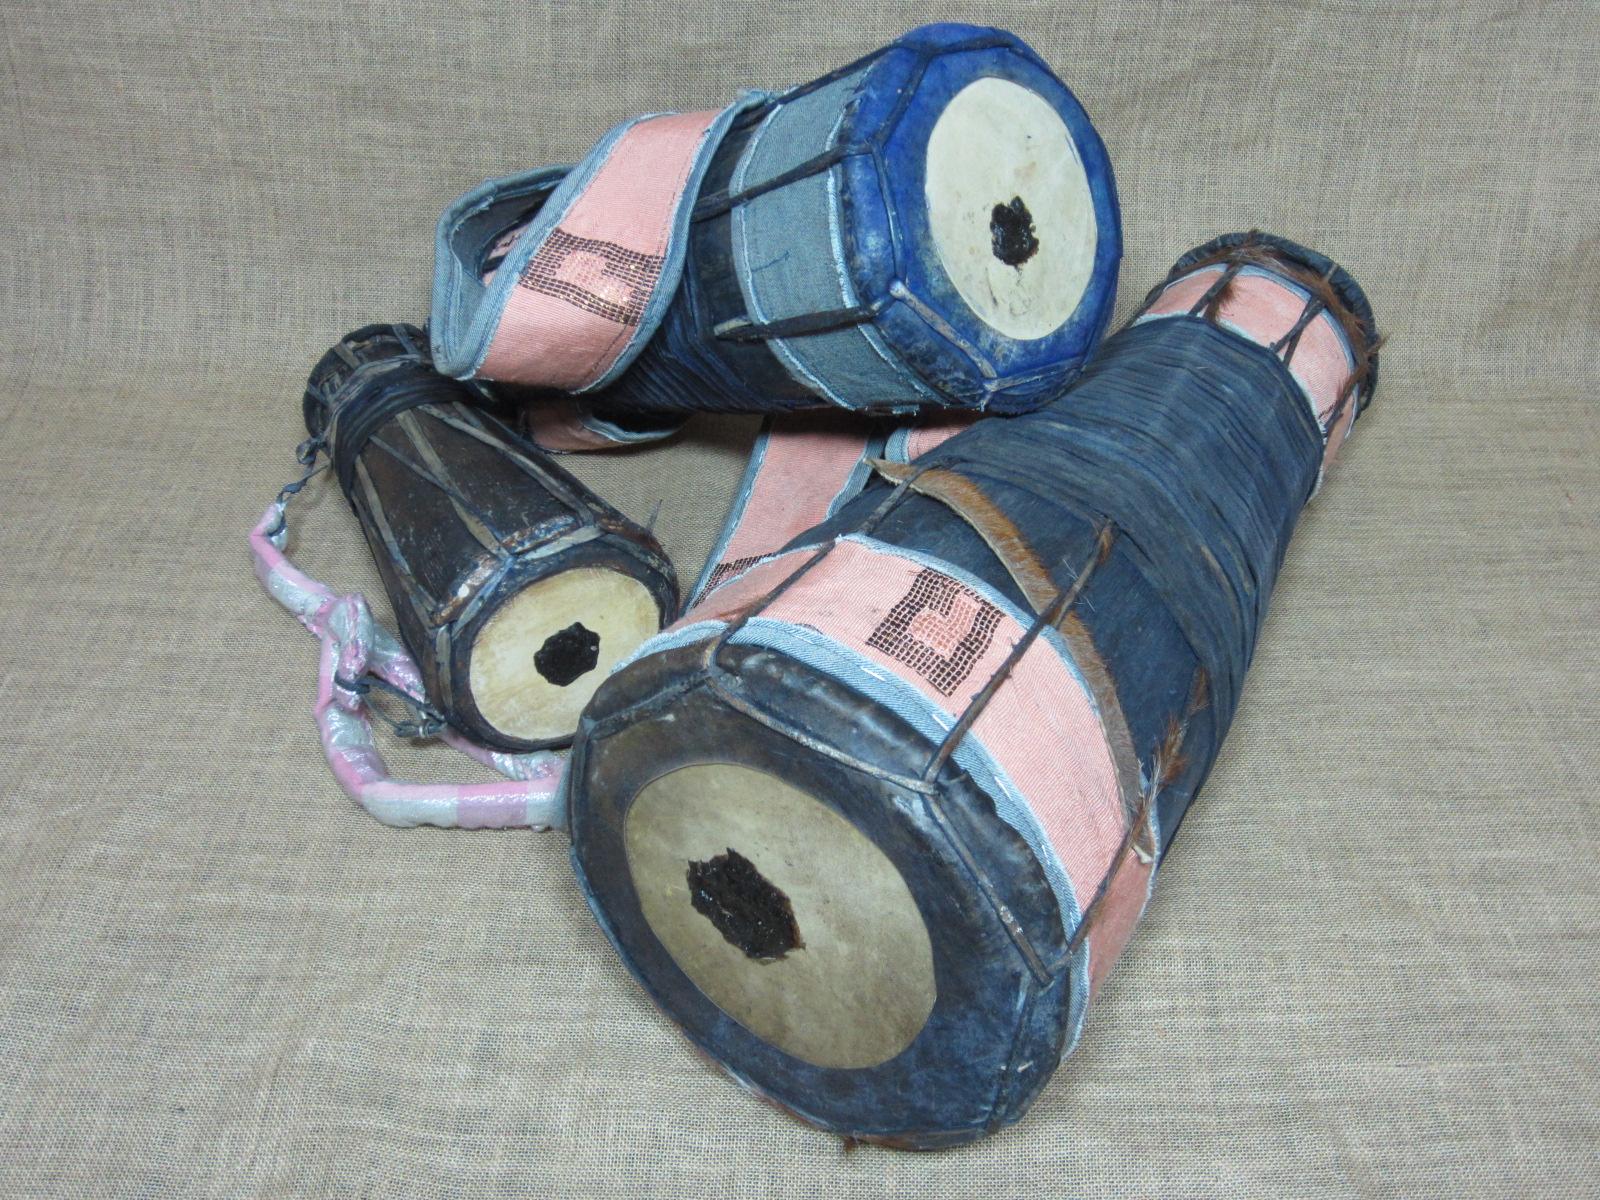 Bata Drum set - I